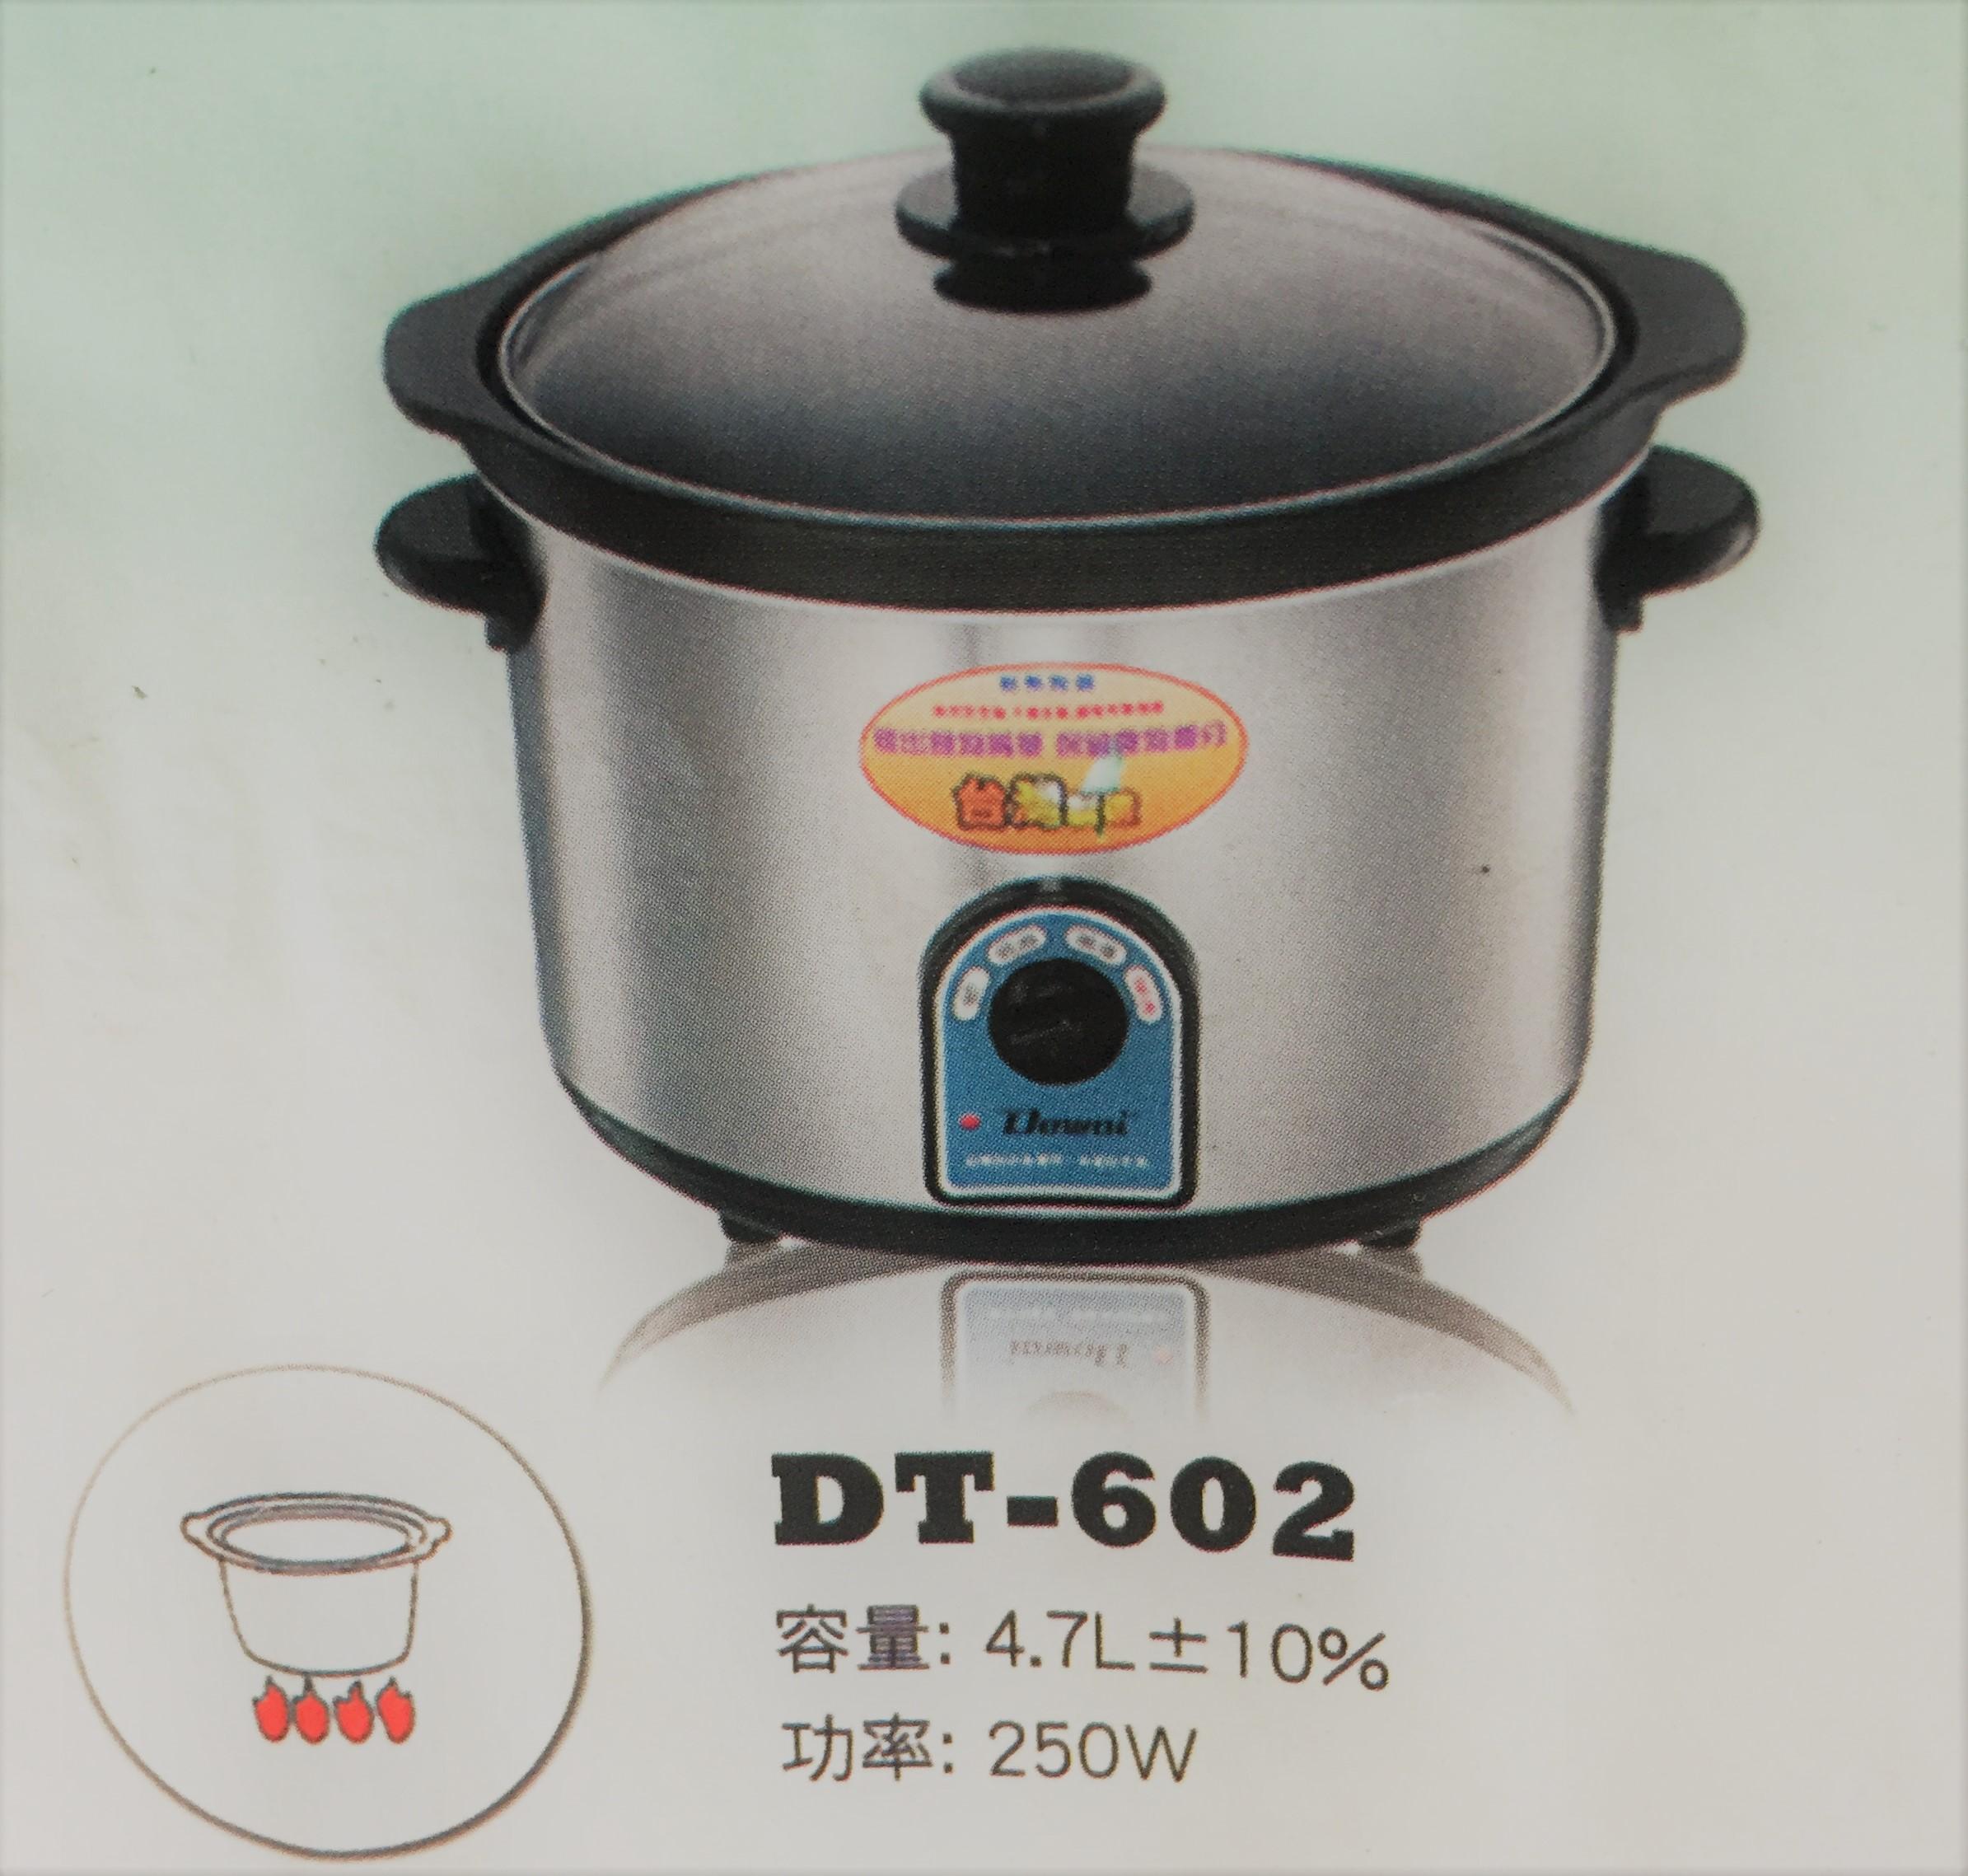 DT-602